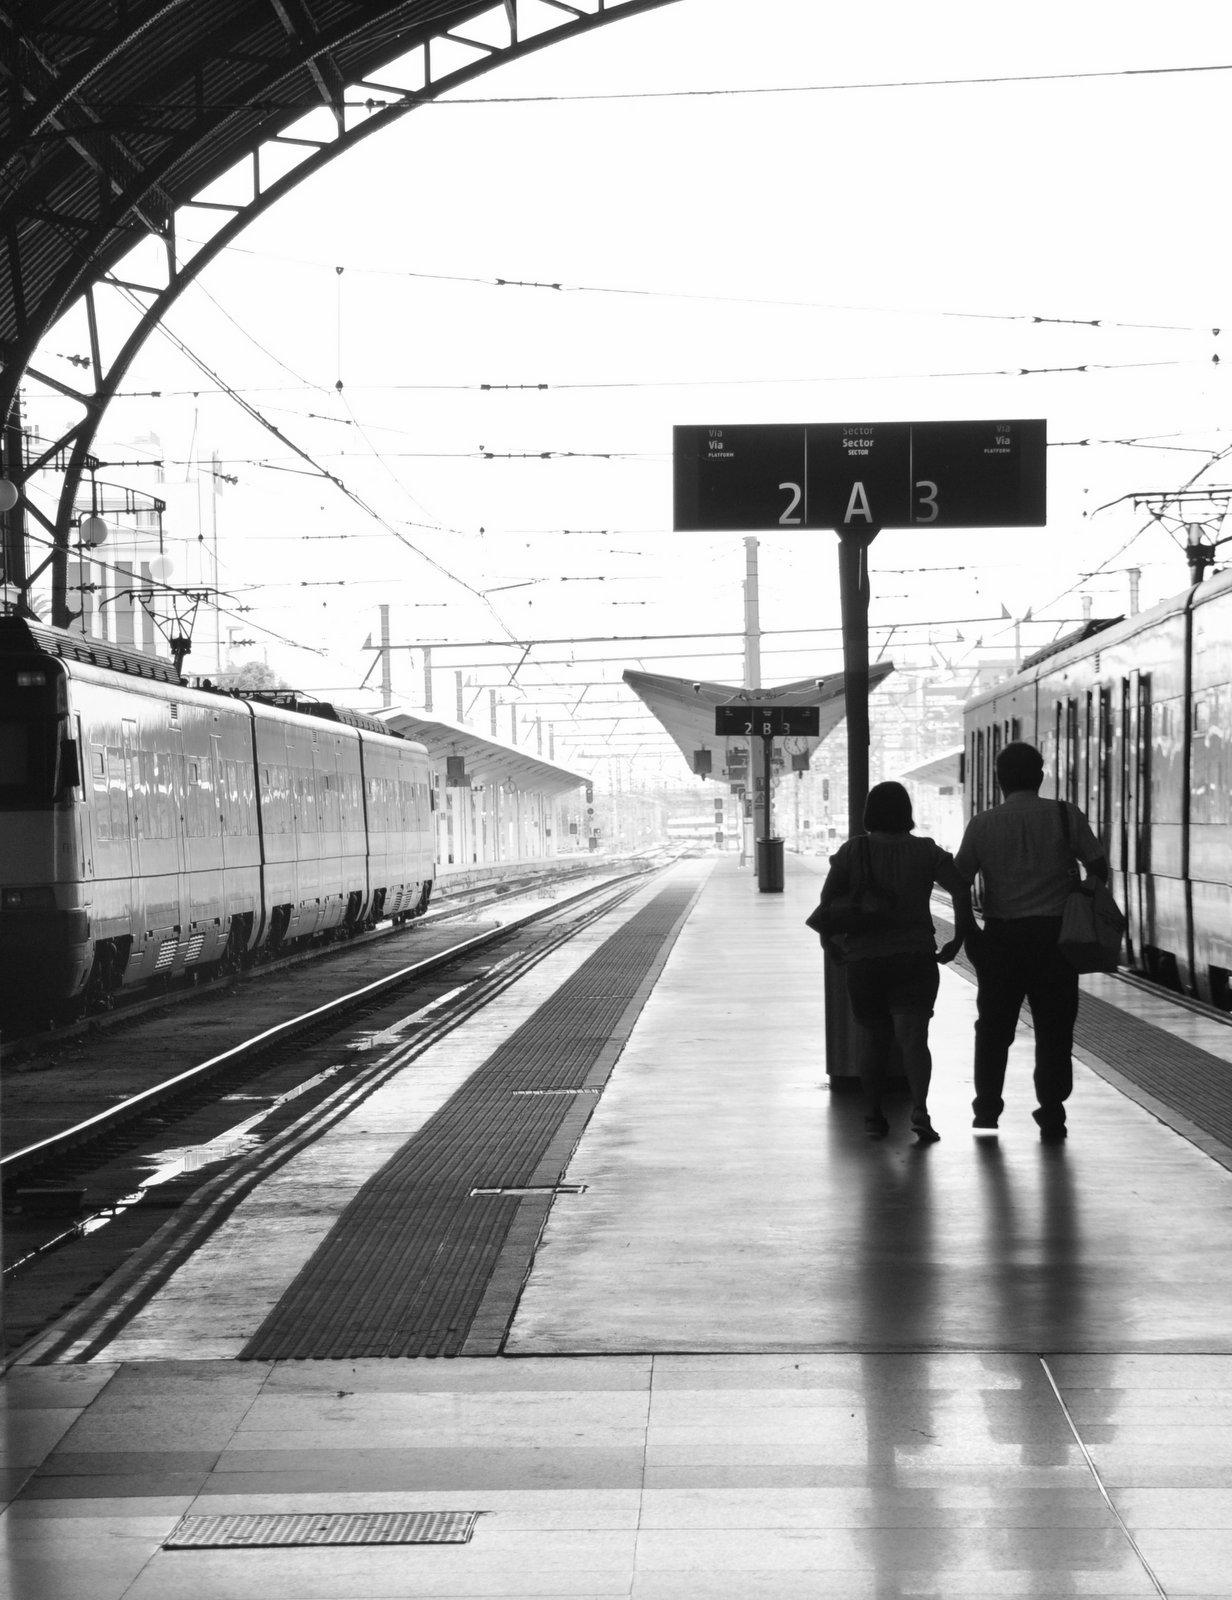 Estacion Nord de trenes